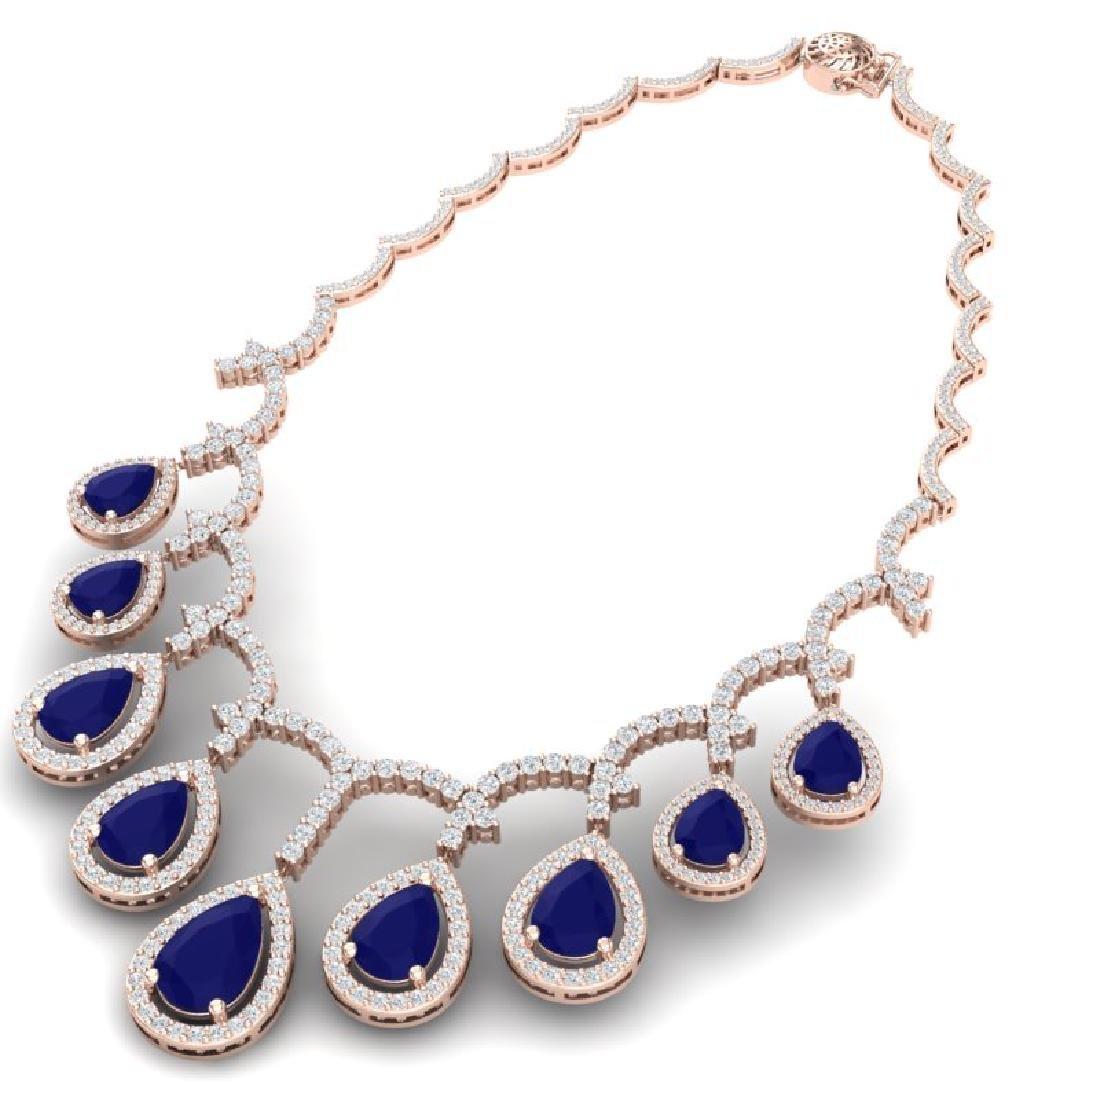 31.5 CTW Royalty Sapphire & VS Diamond Necklace 18K - 3